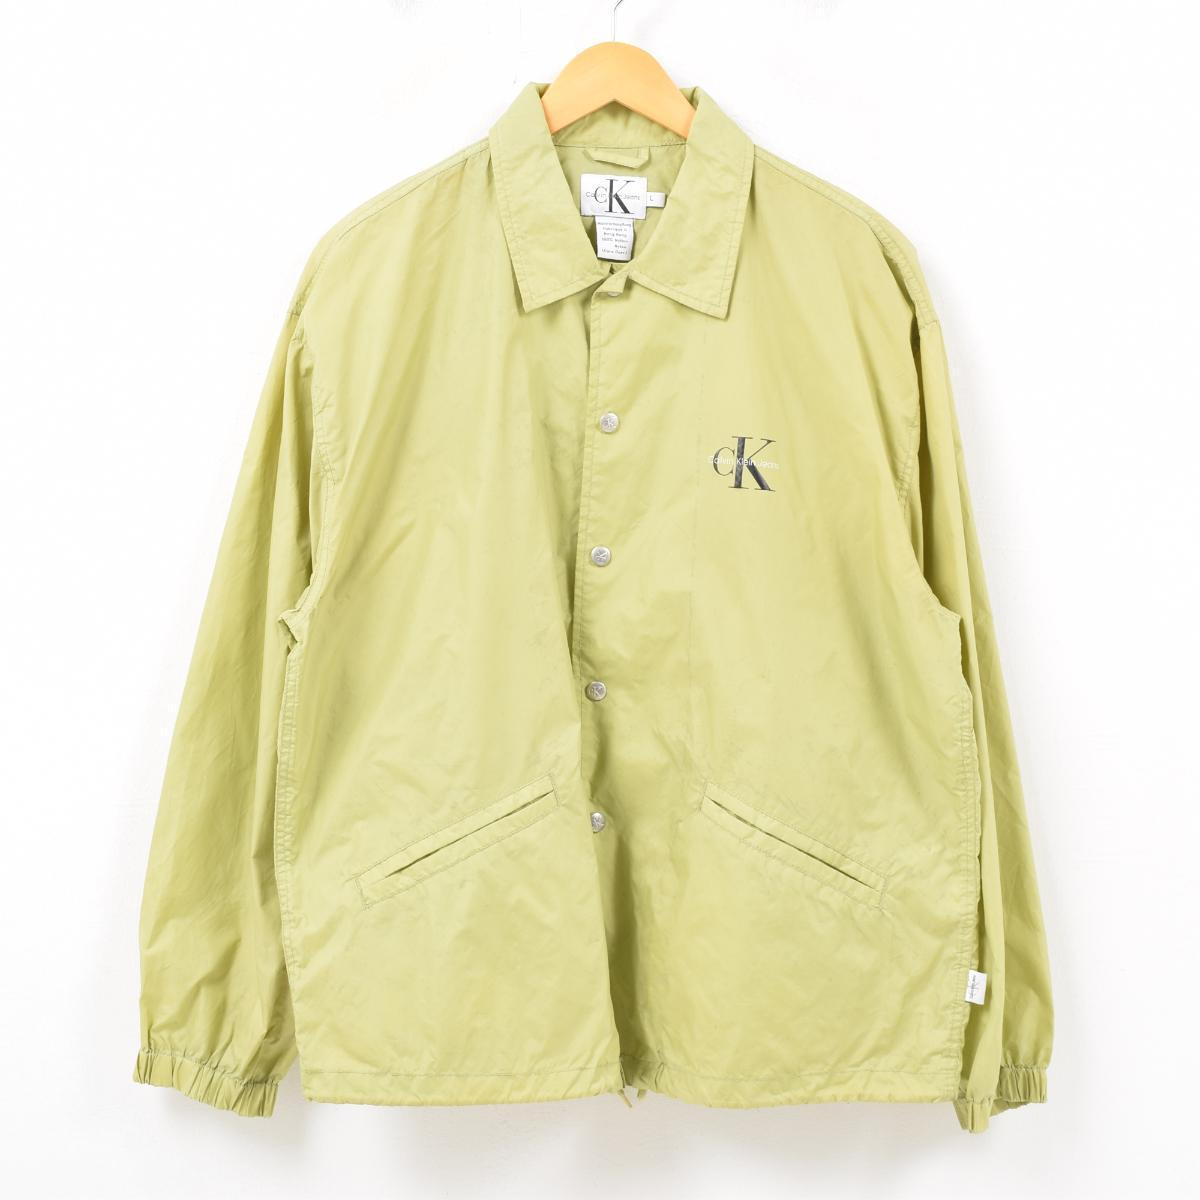 64ccee45d 90s Calvin Klein Calvin klein JEANS decalogo big logo back logo coach  jacket men L ...